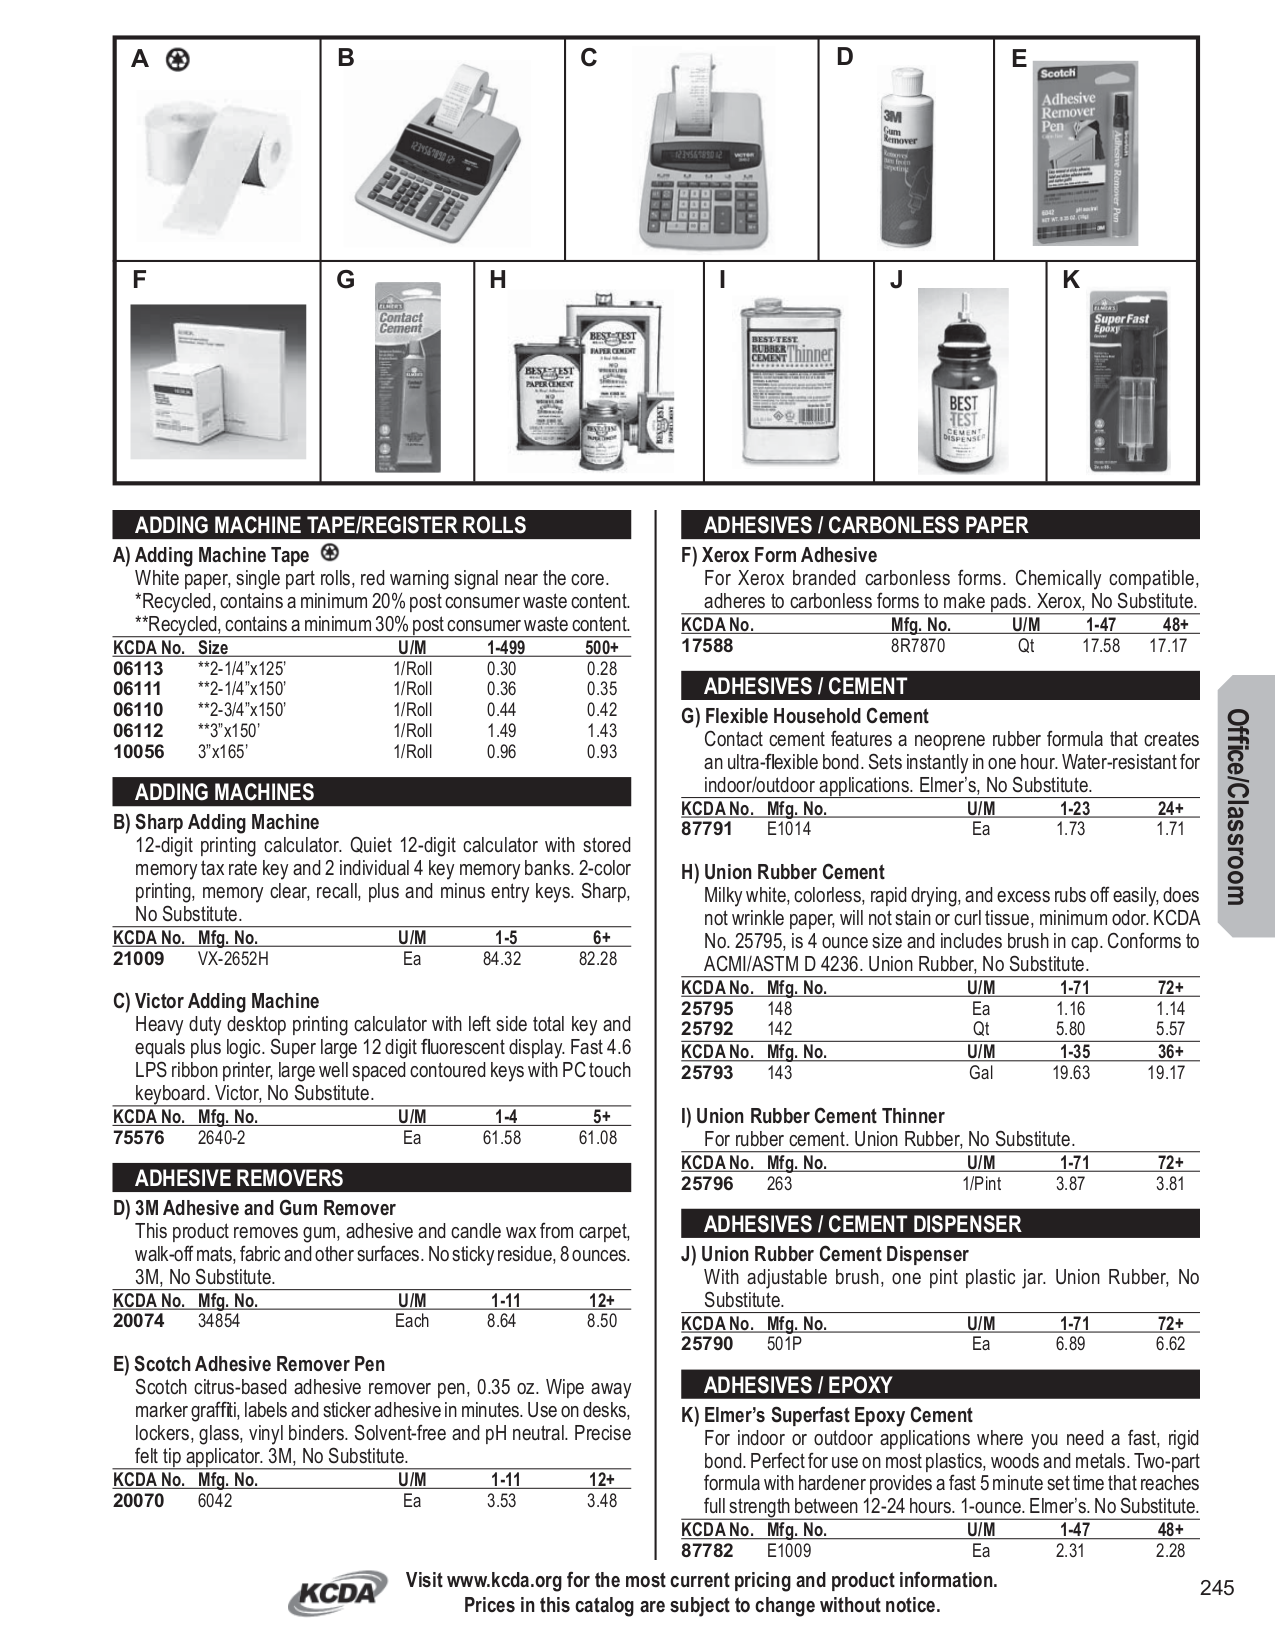 download free pdf for panasonic kx fp121 fax machine manual rh umlib com Panasonic Fax Machines Models Panasonic Fax and Answering Machine